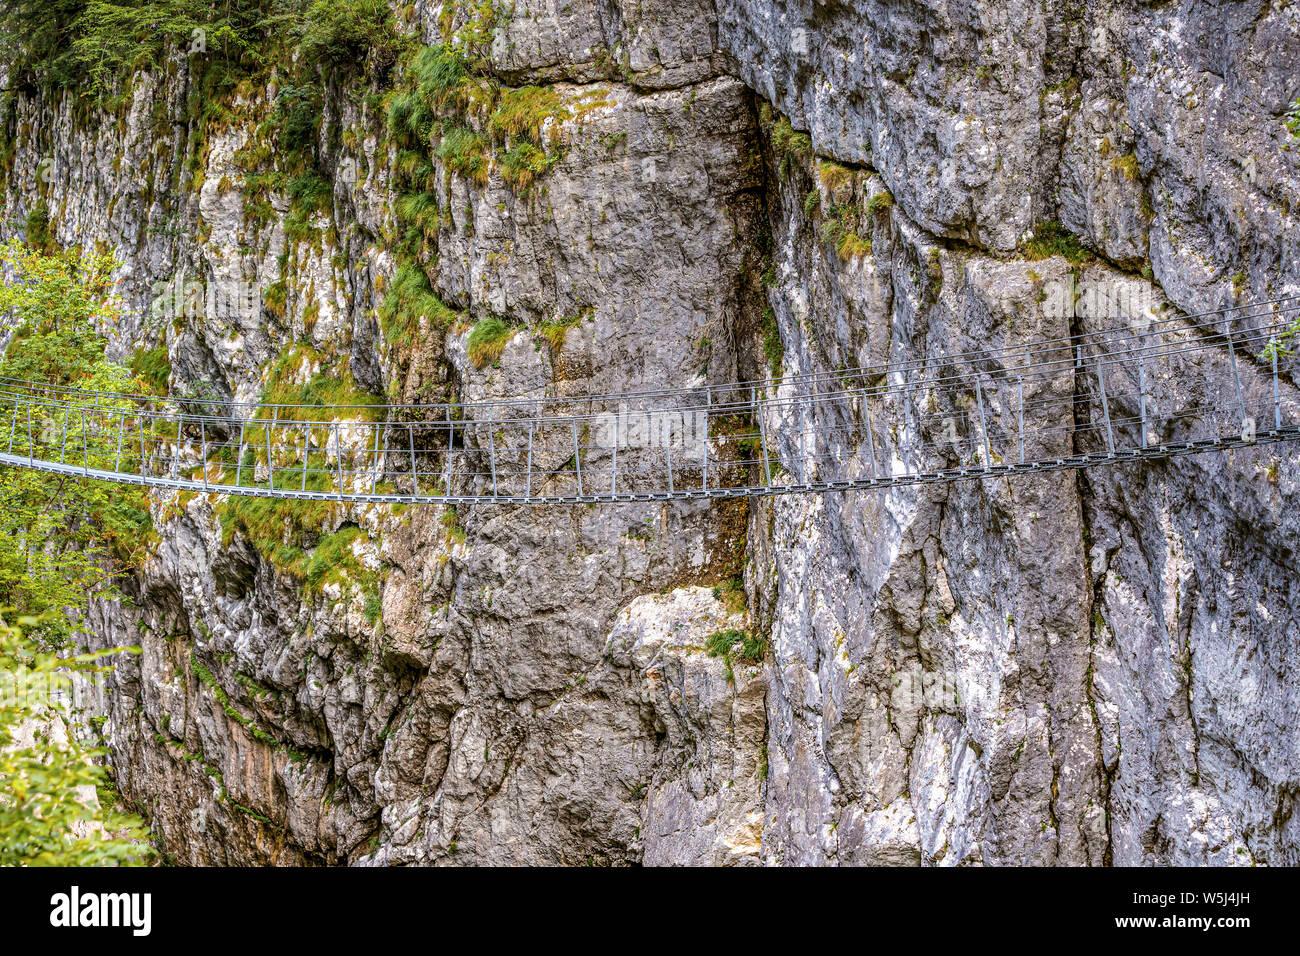 Italia Friuli Barcis Antiguo camino del Val Cellina - Puente del Himalaya - Parque Natural de la Dolomiti Friulane Foto de stock